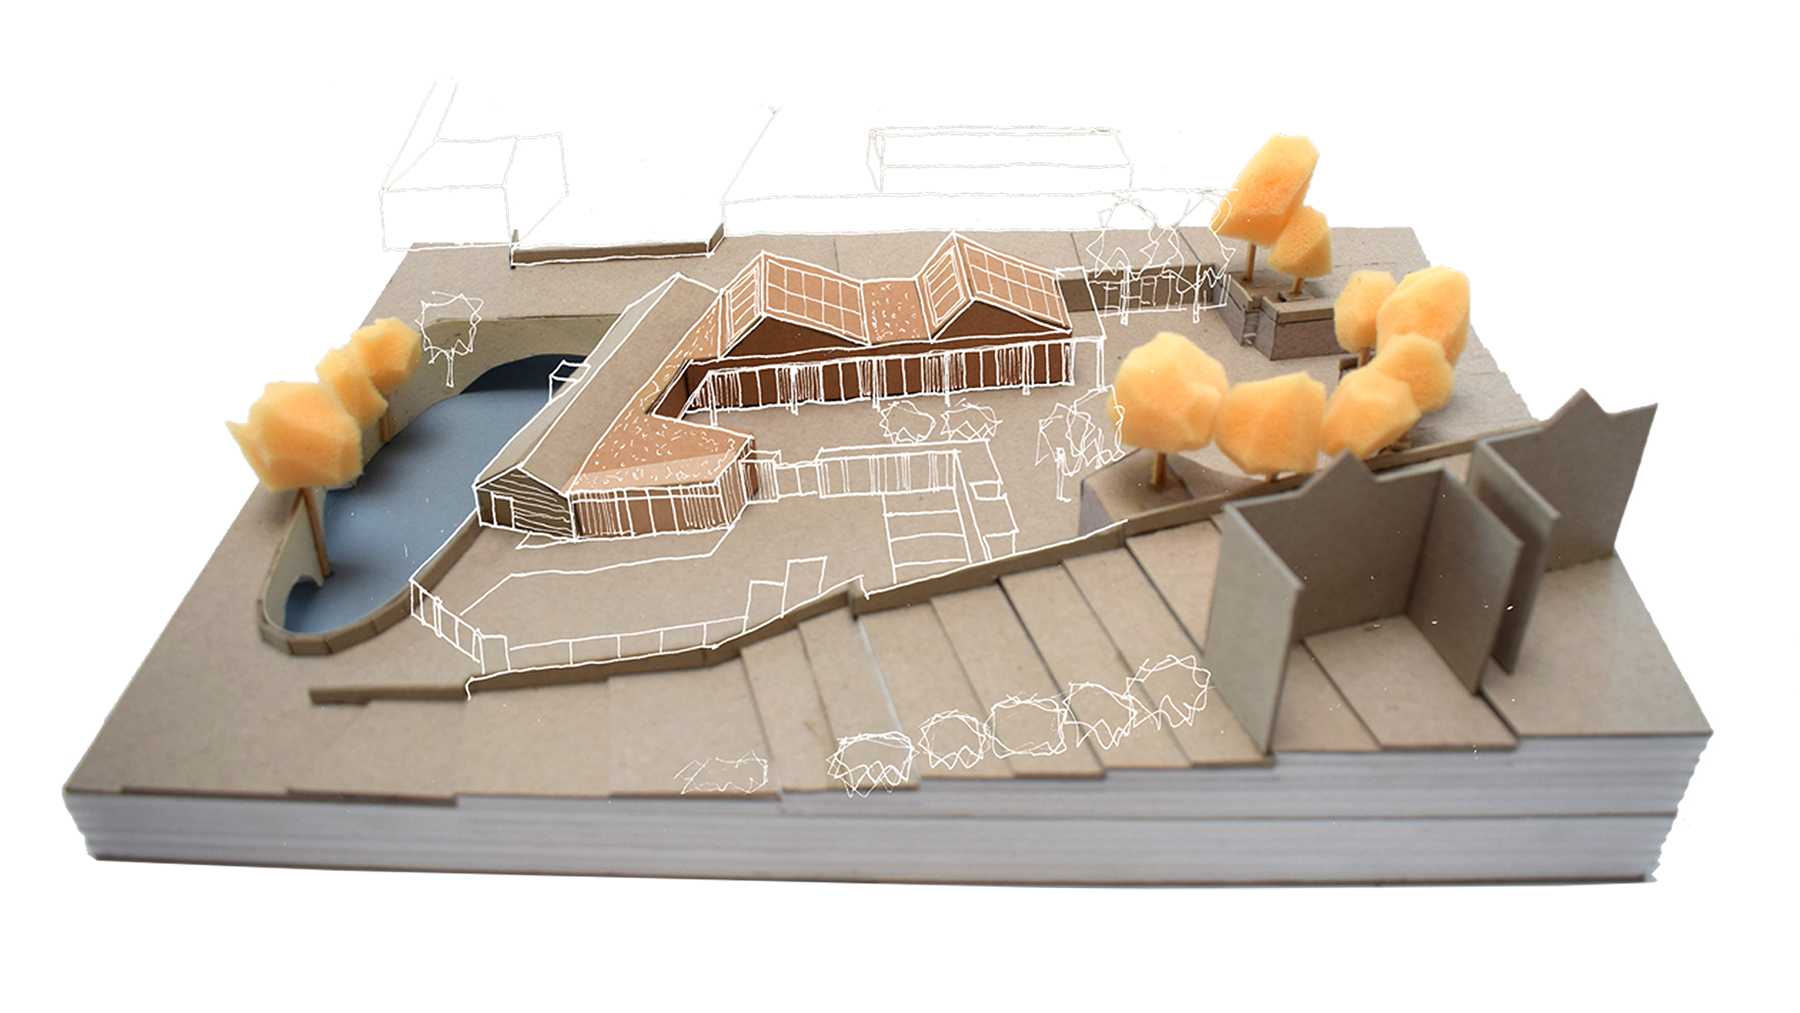 Sarah-Wigglesworth-Architects Portland-Nursery Model-2 1800-slide